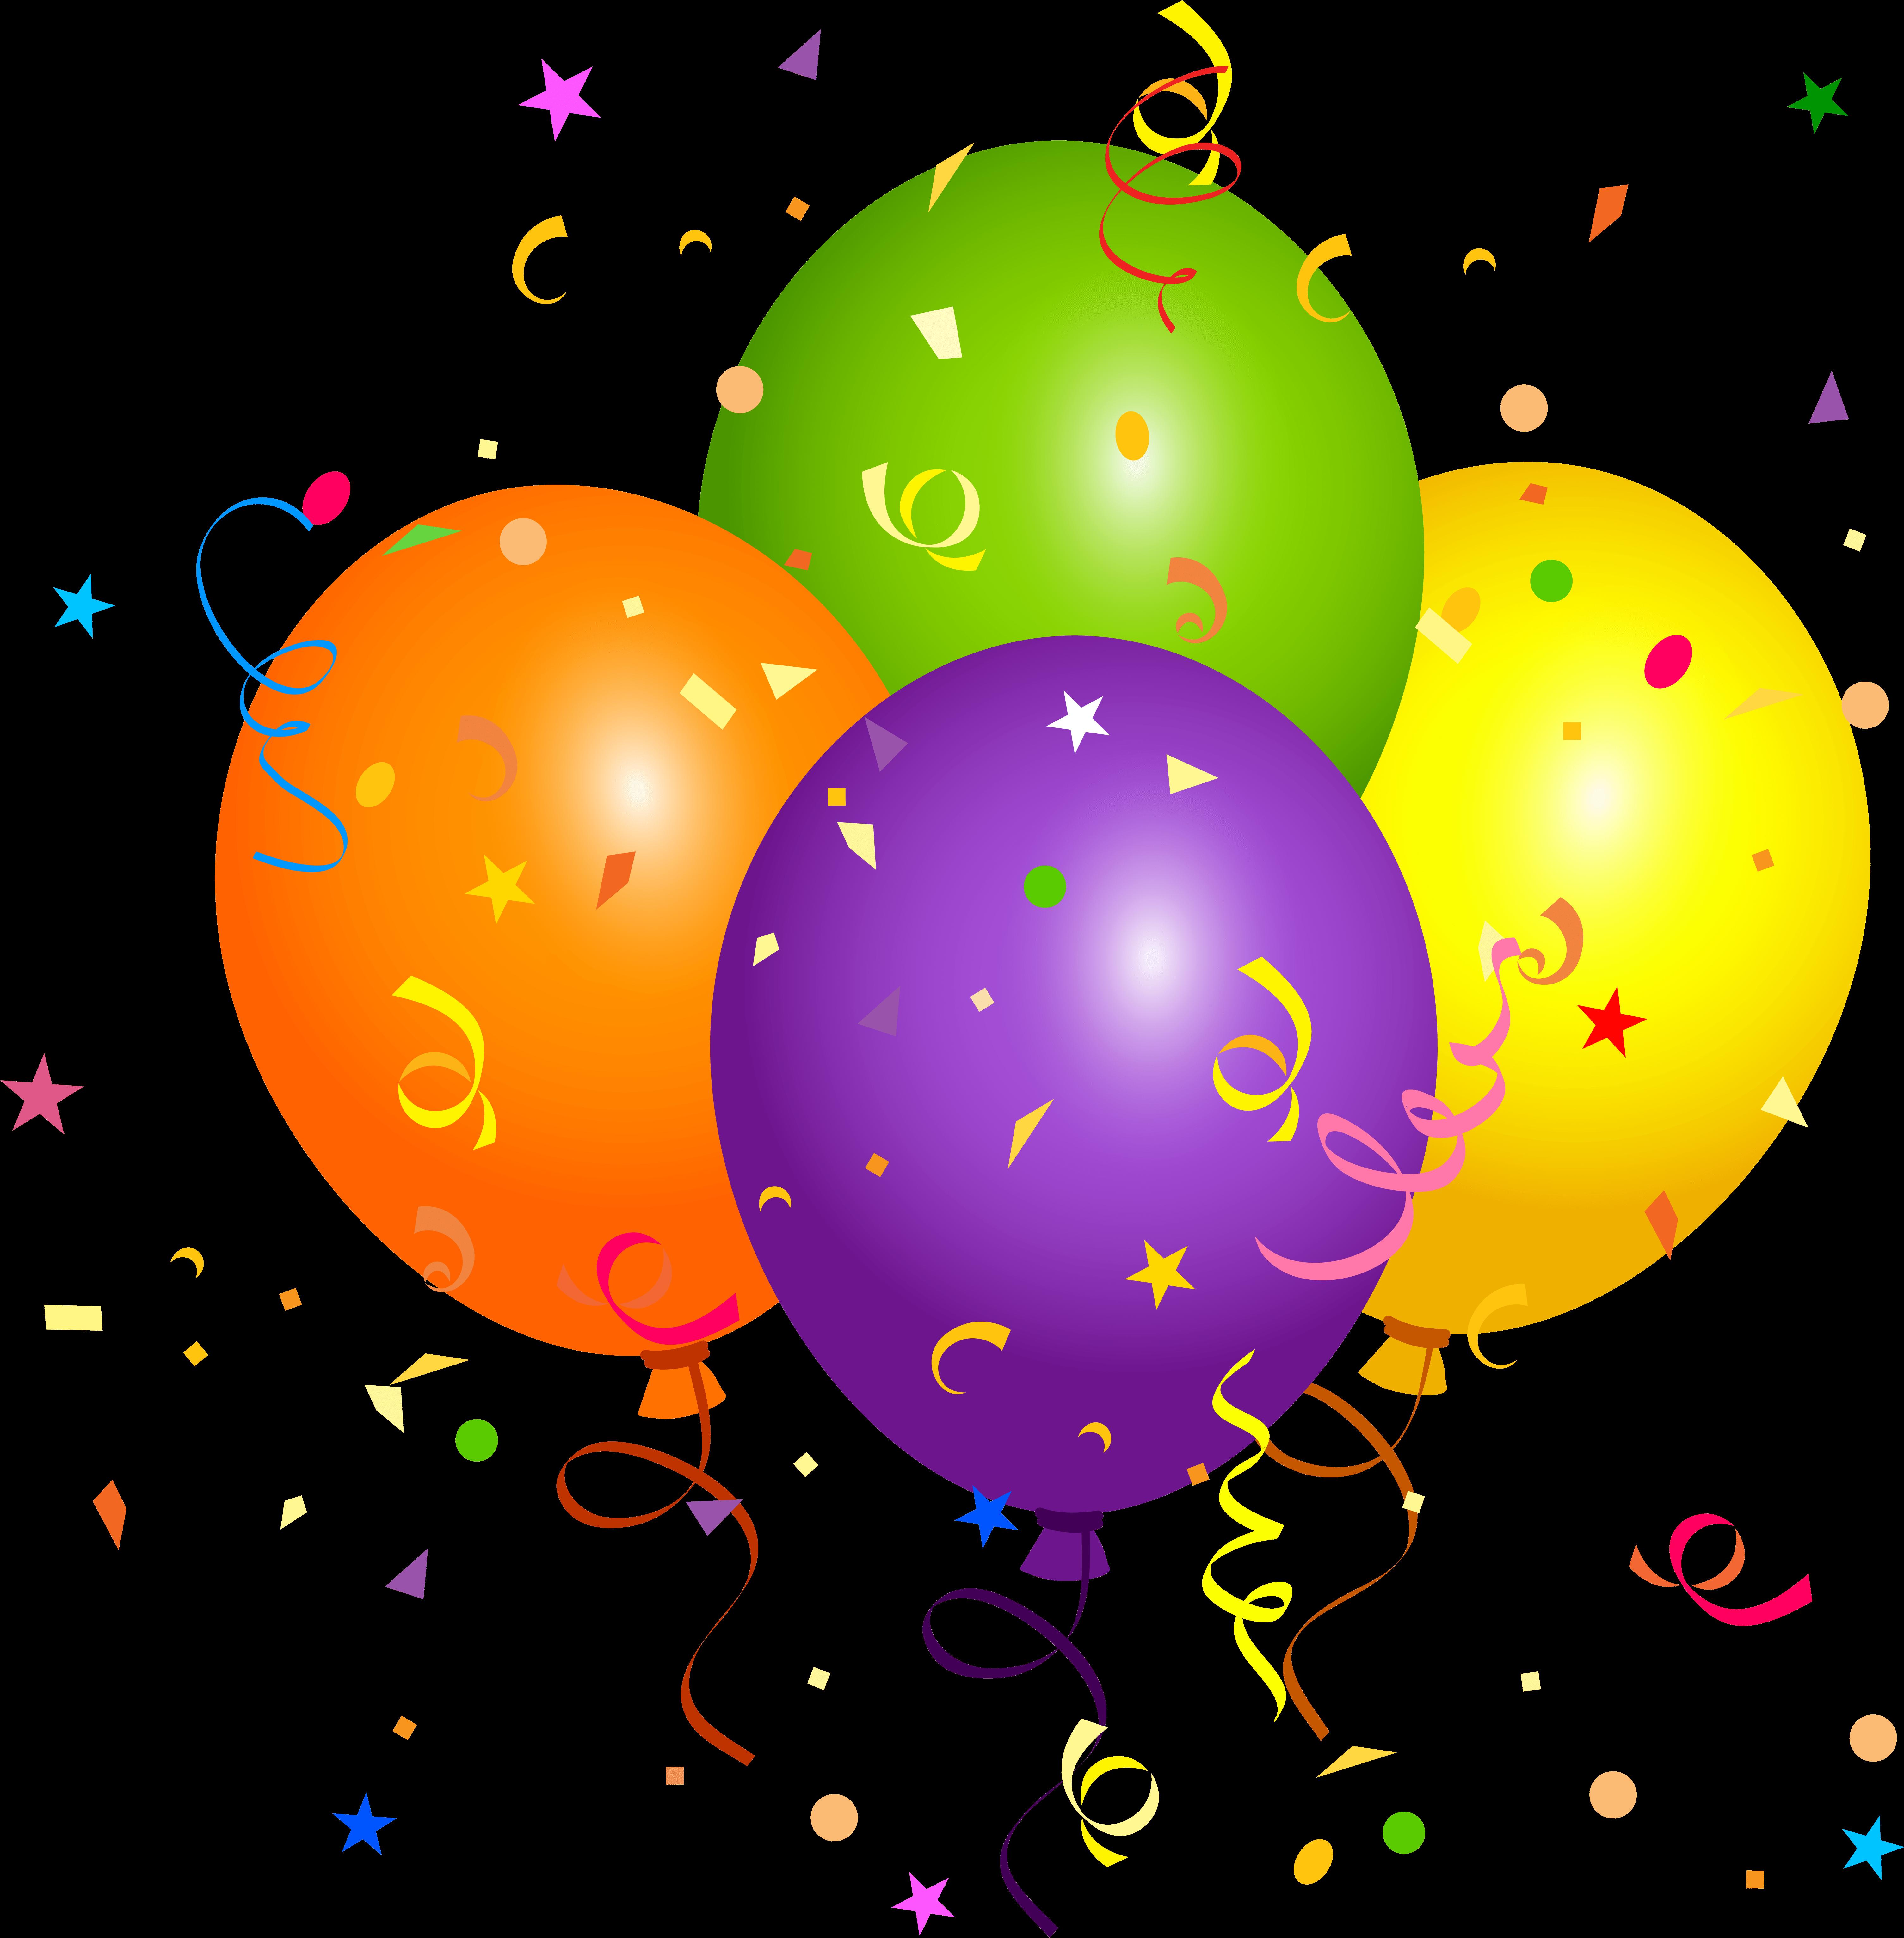 Birthday Balloons Clipart, Balloon Clipart, Happy Birthday ... (6021 x 6130 Pixel)